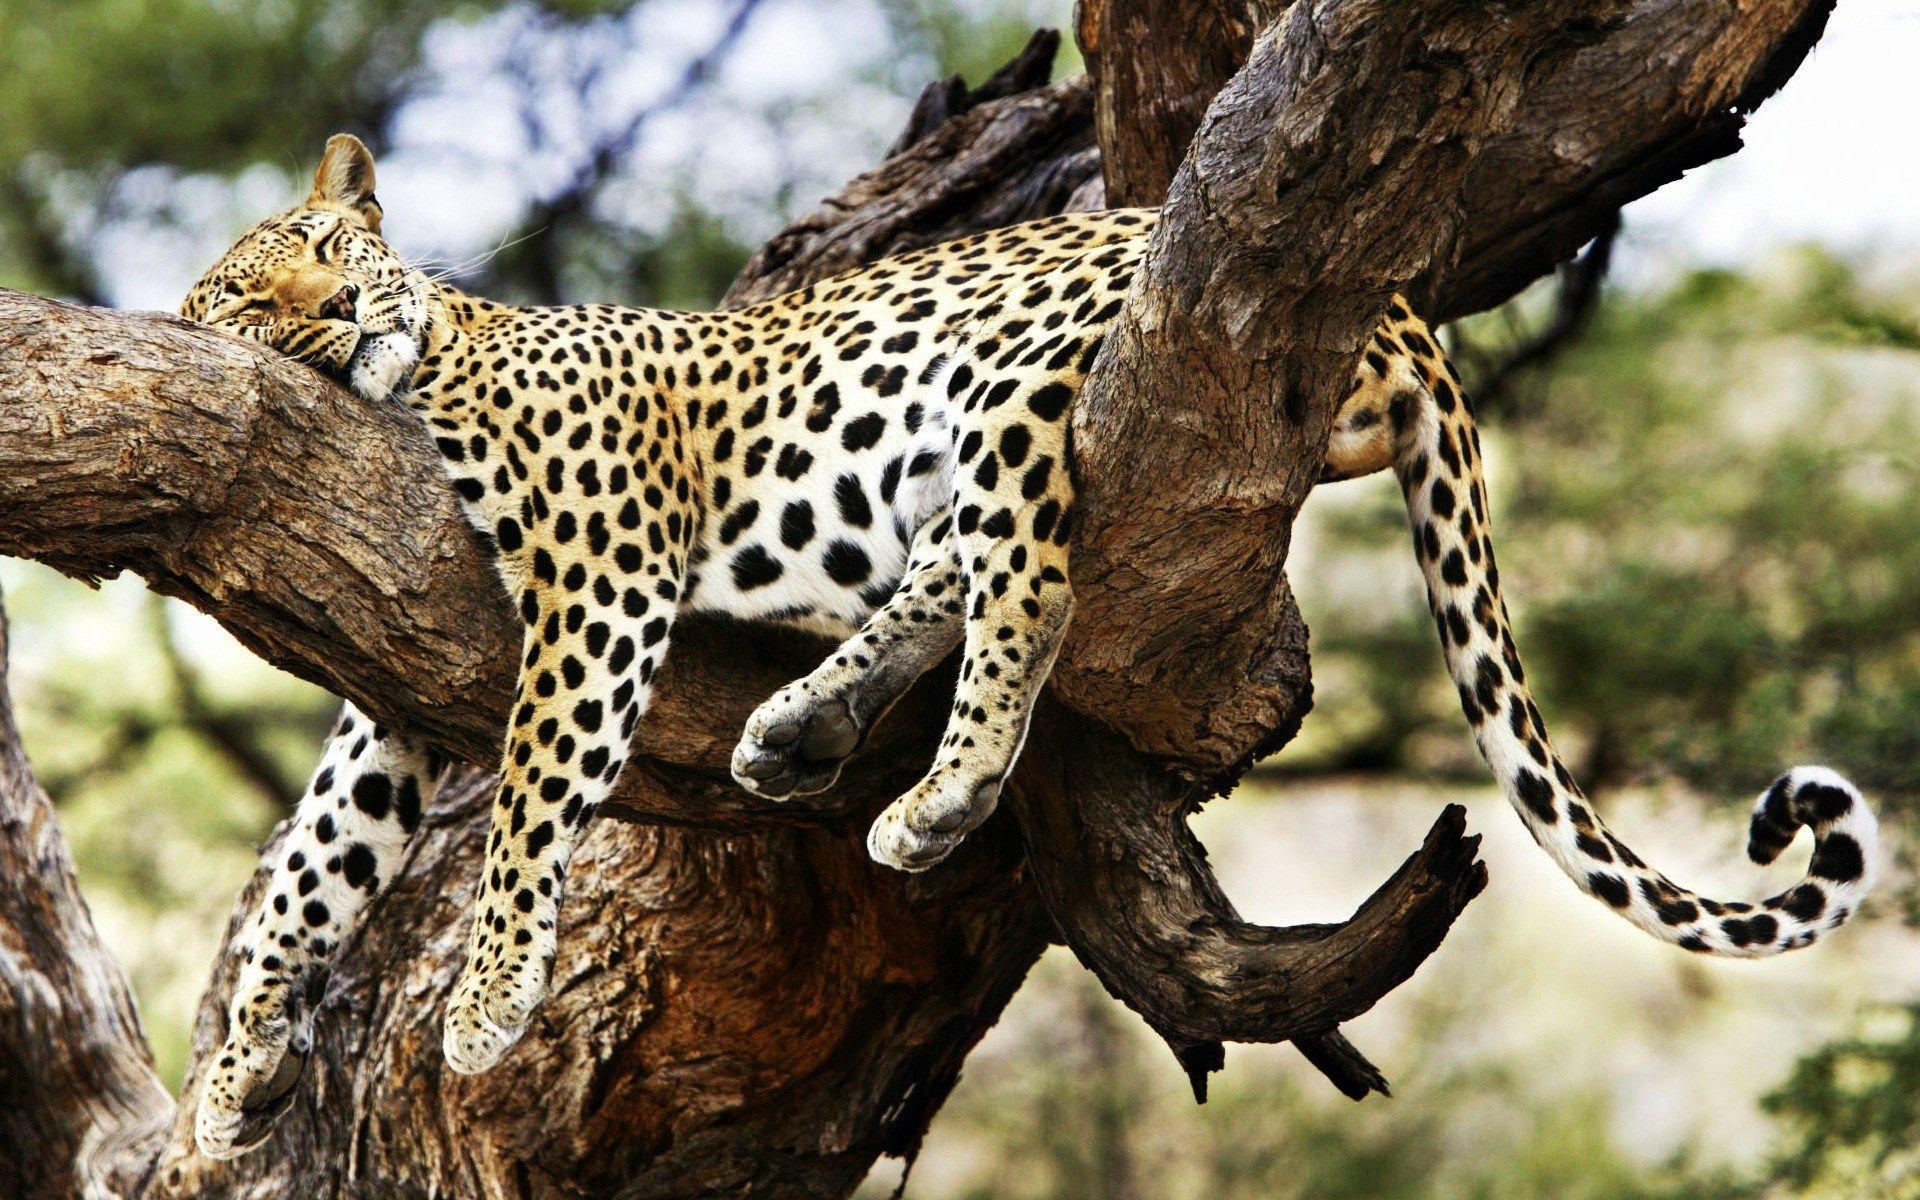 Cheetah Wallpaper Hd For Desktop Widescreen Wild Animals Photos Sleeping Animals Animals Beautiful